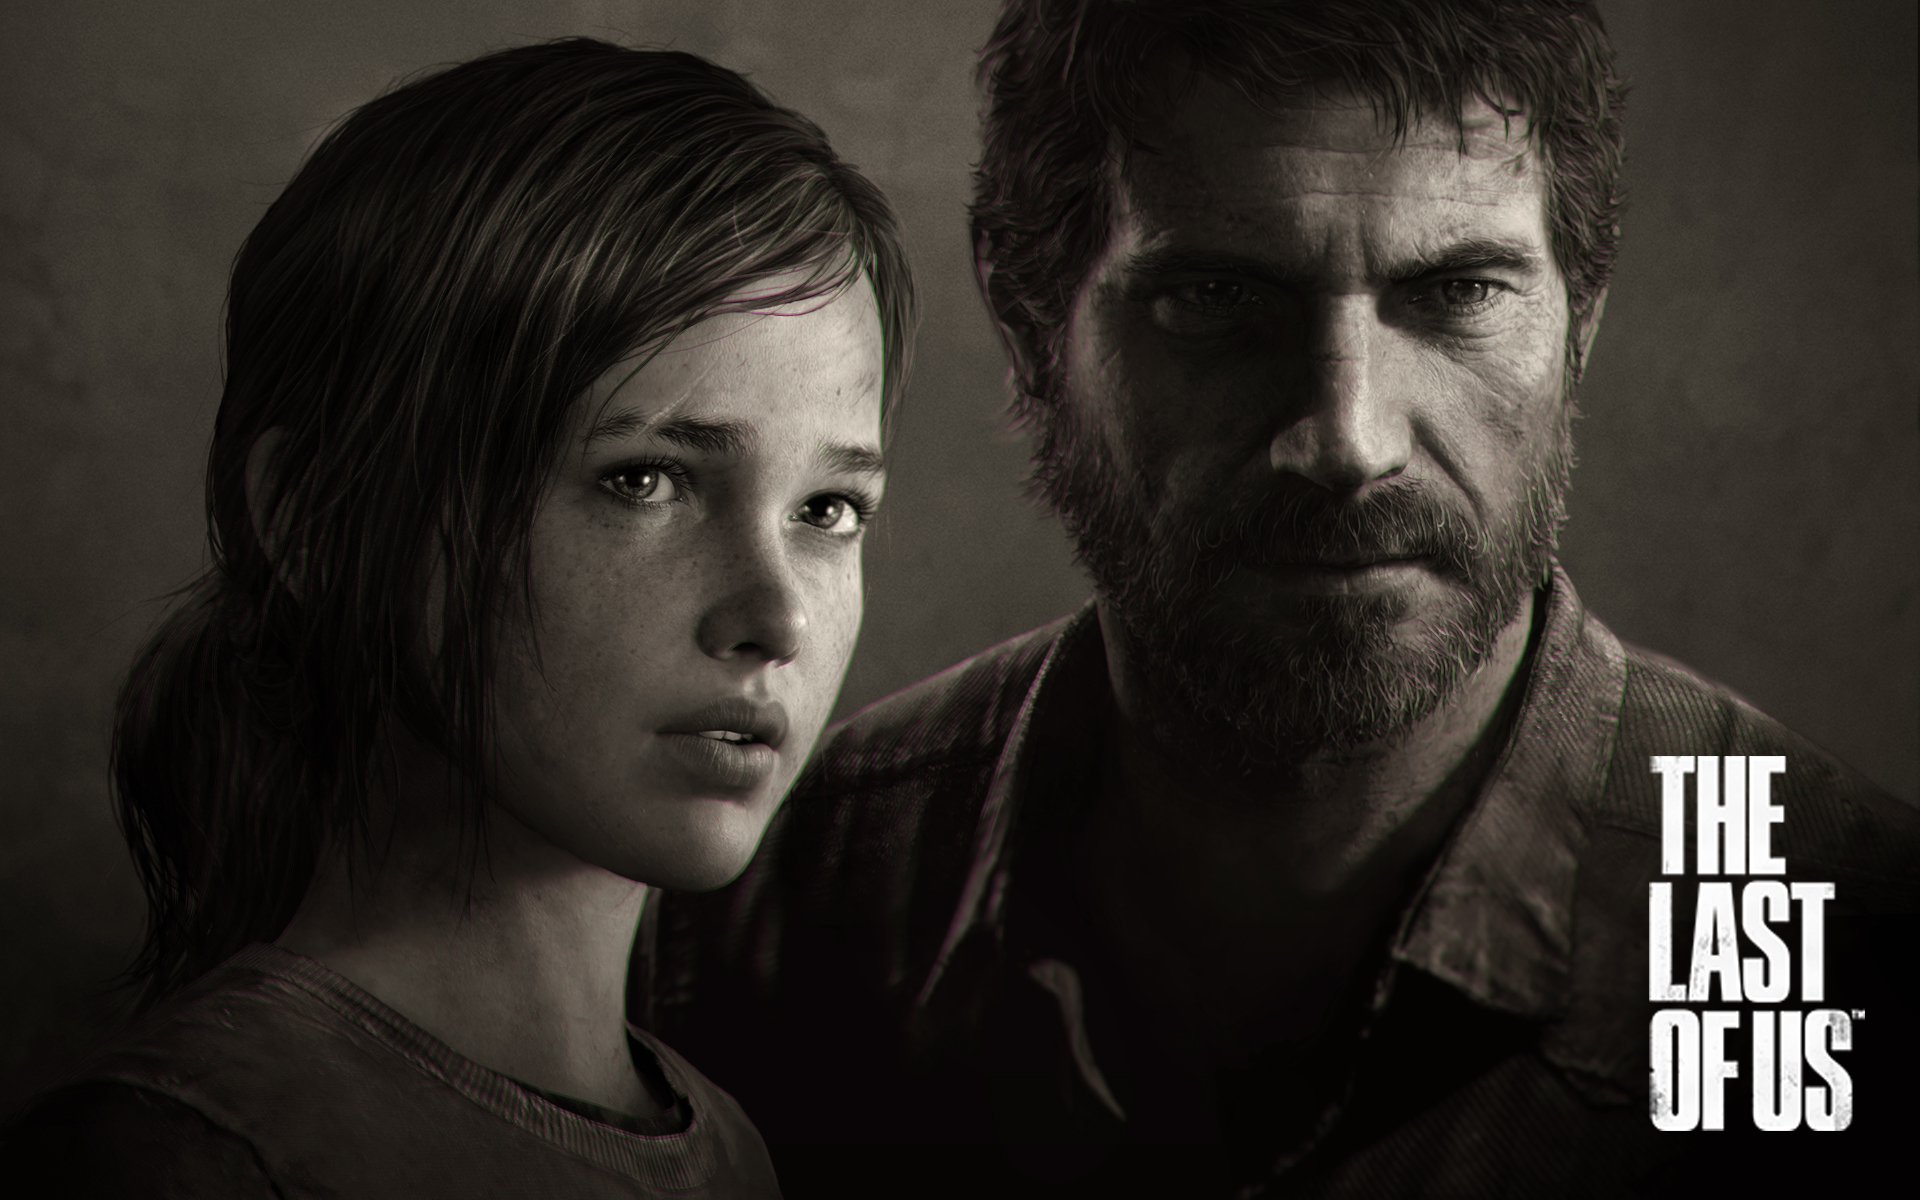 The Last of Us 바탕화면